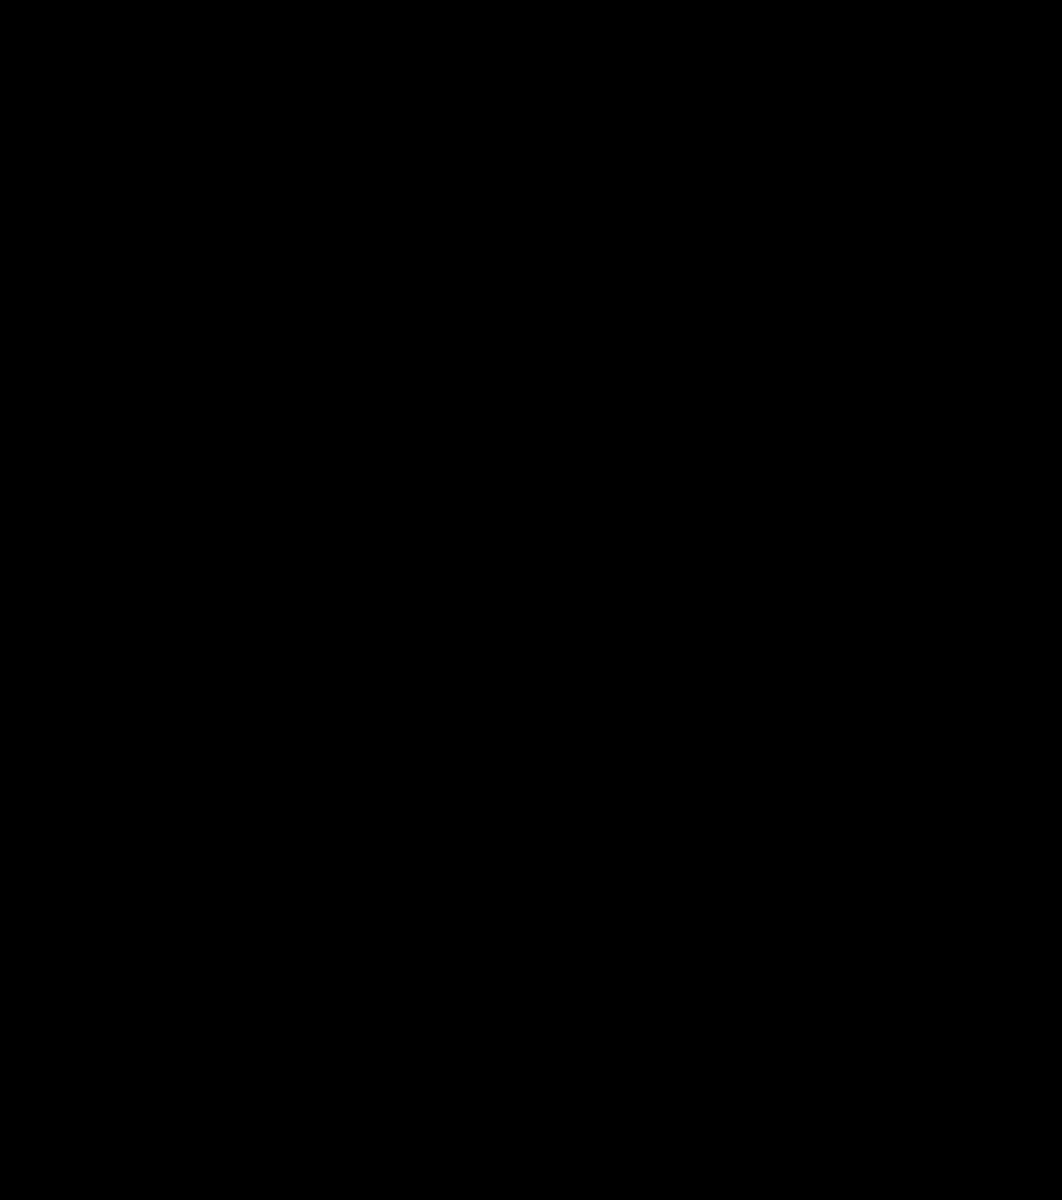 Calvin Klein 5-pack jock straps pride multi-XL